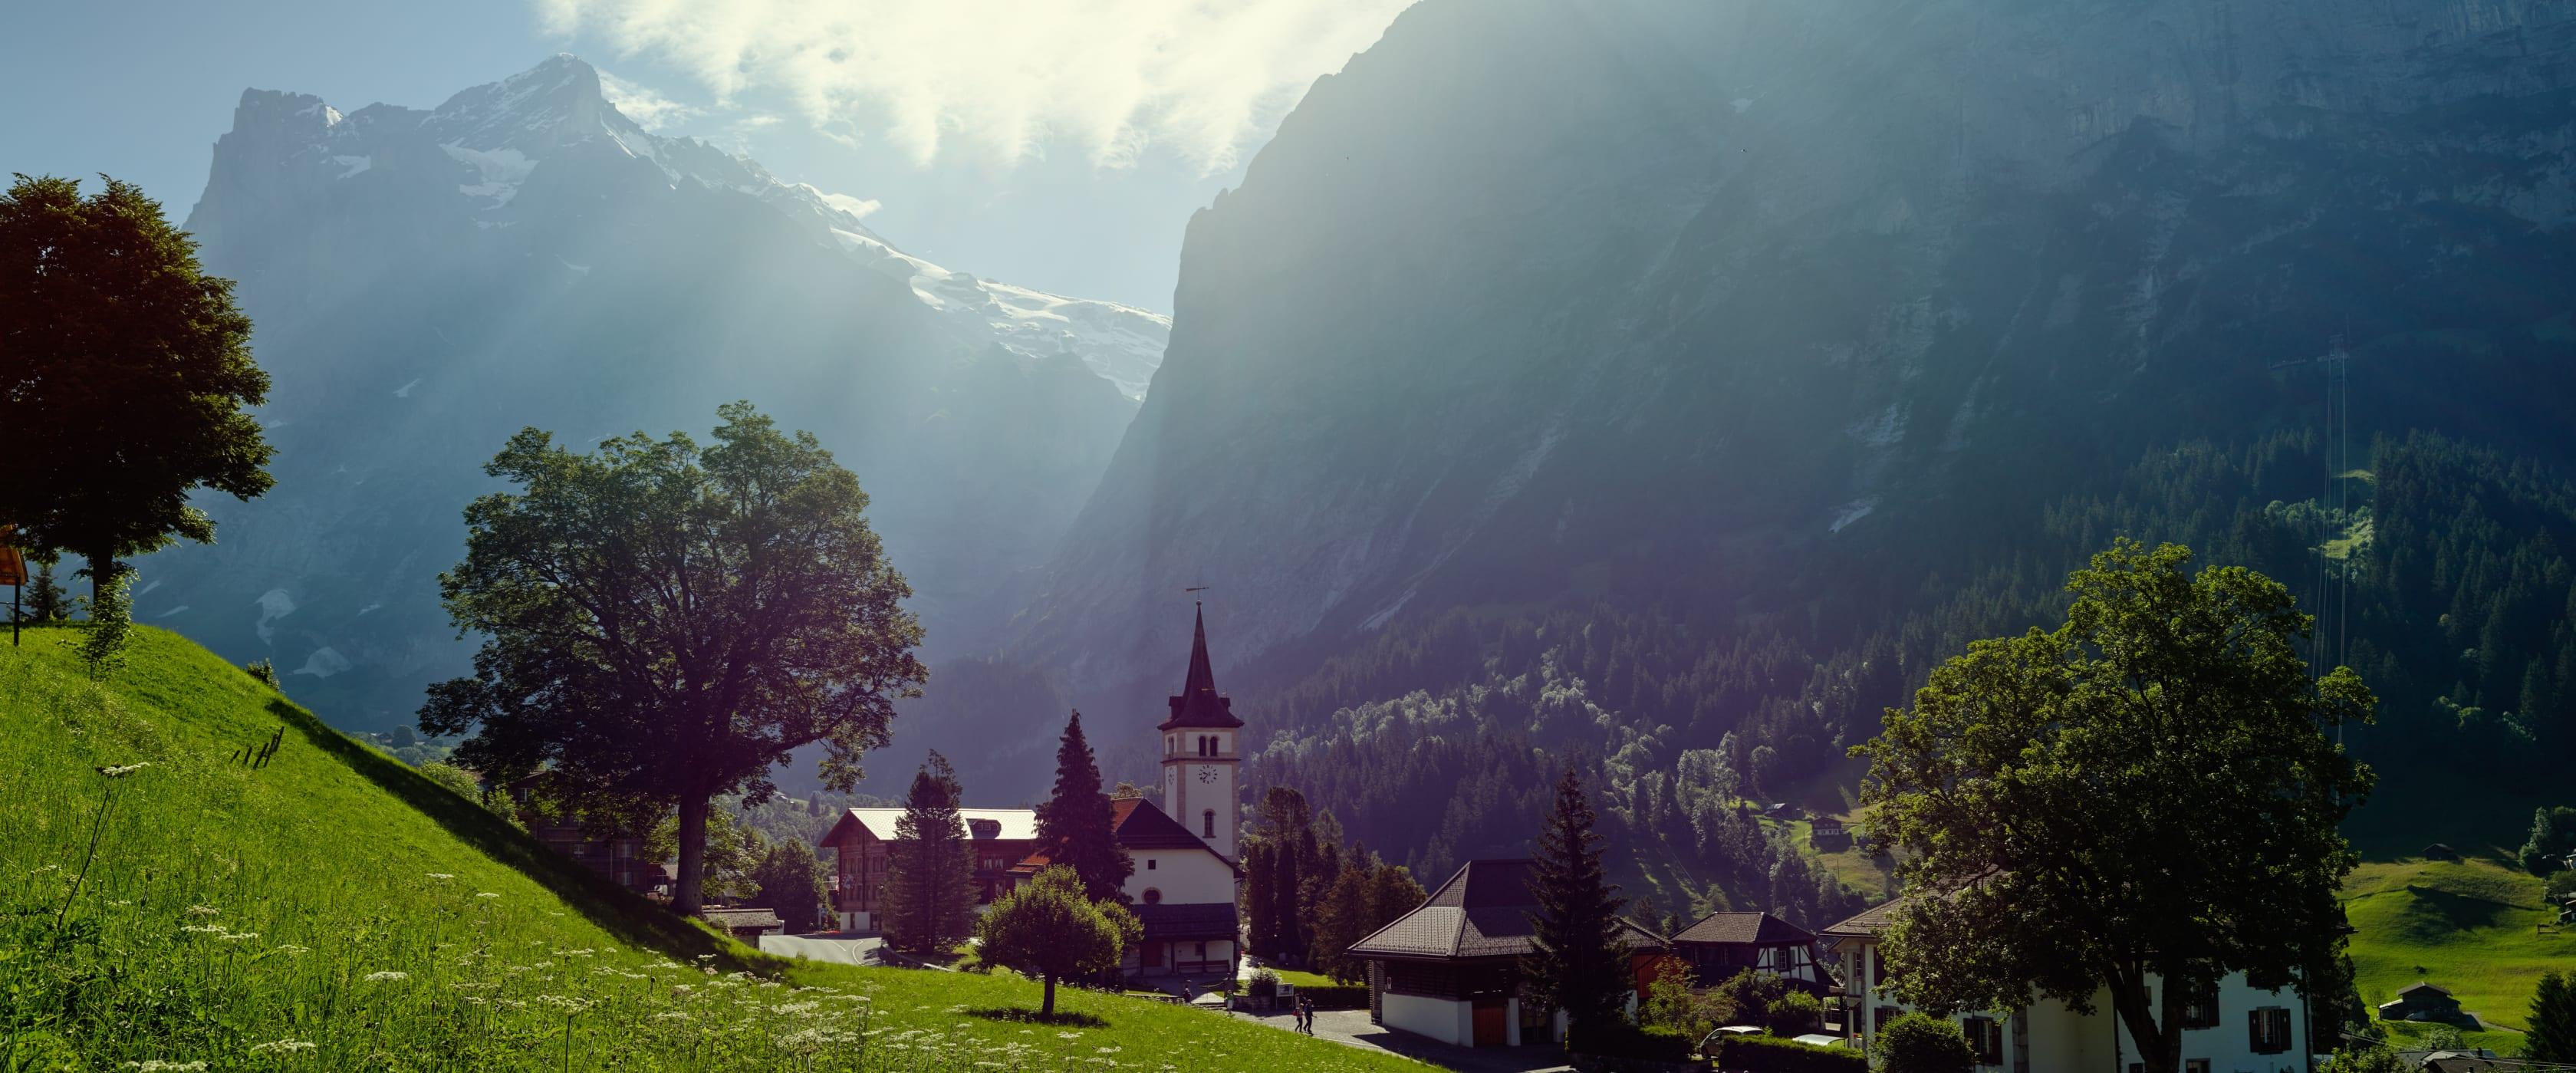 Grindelwald Sommer Wetterhorn Kirche